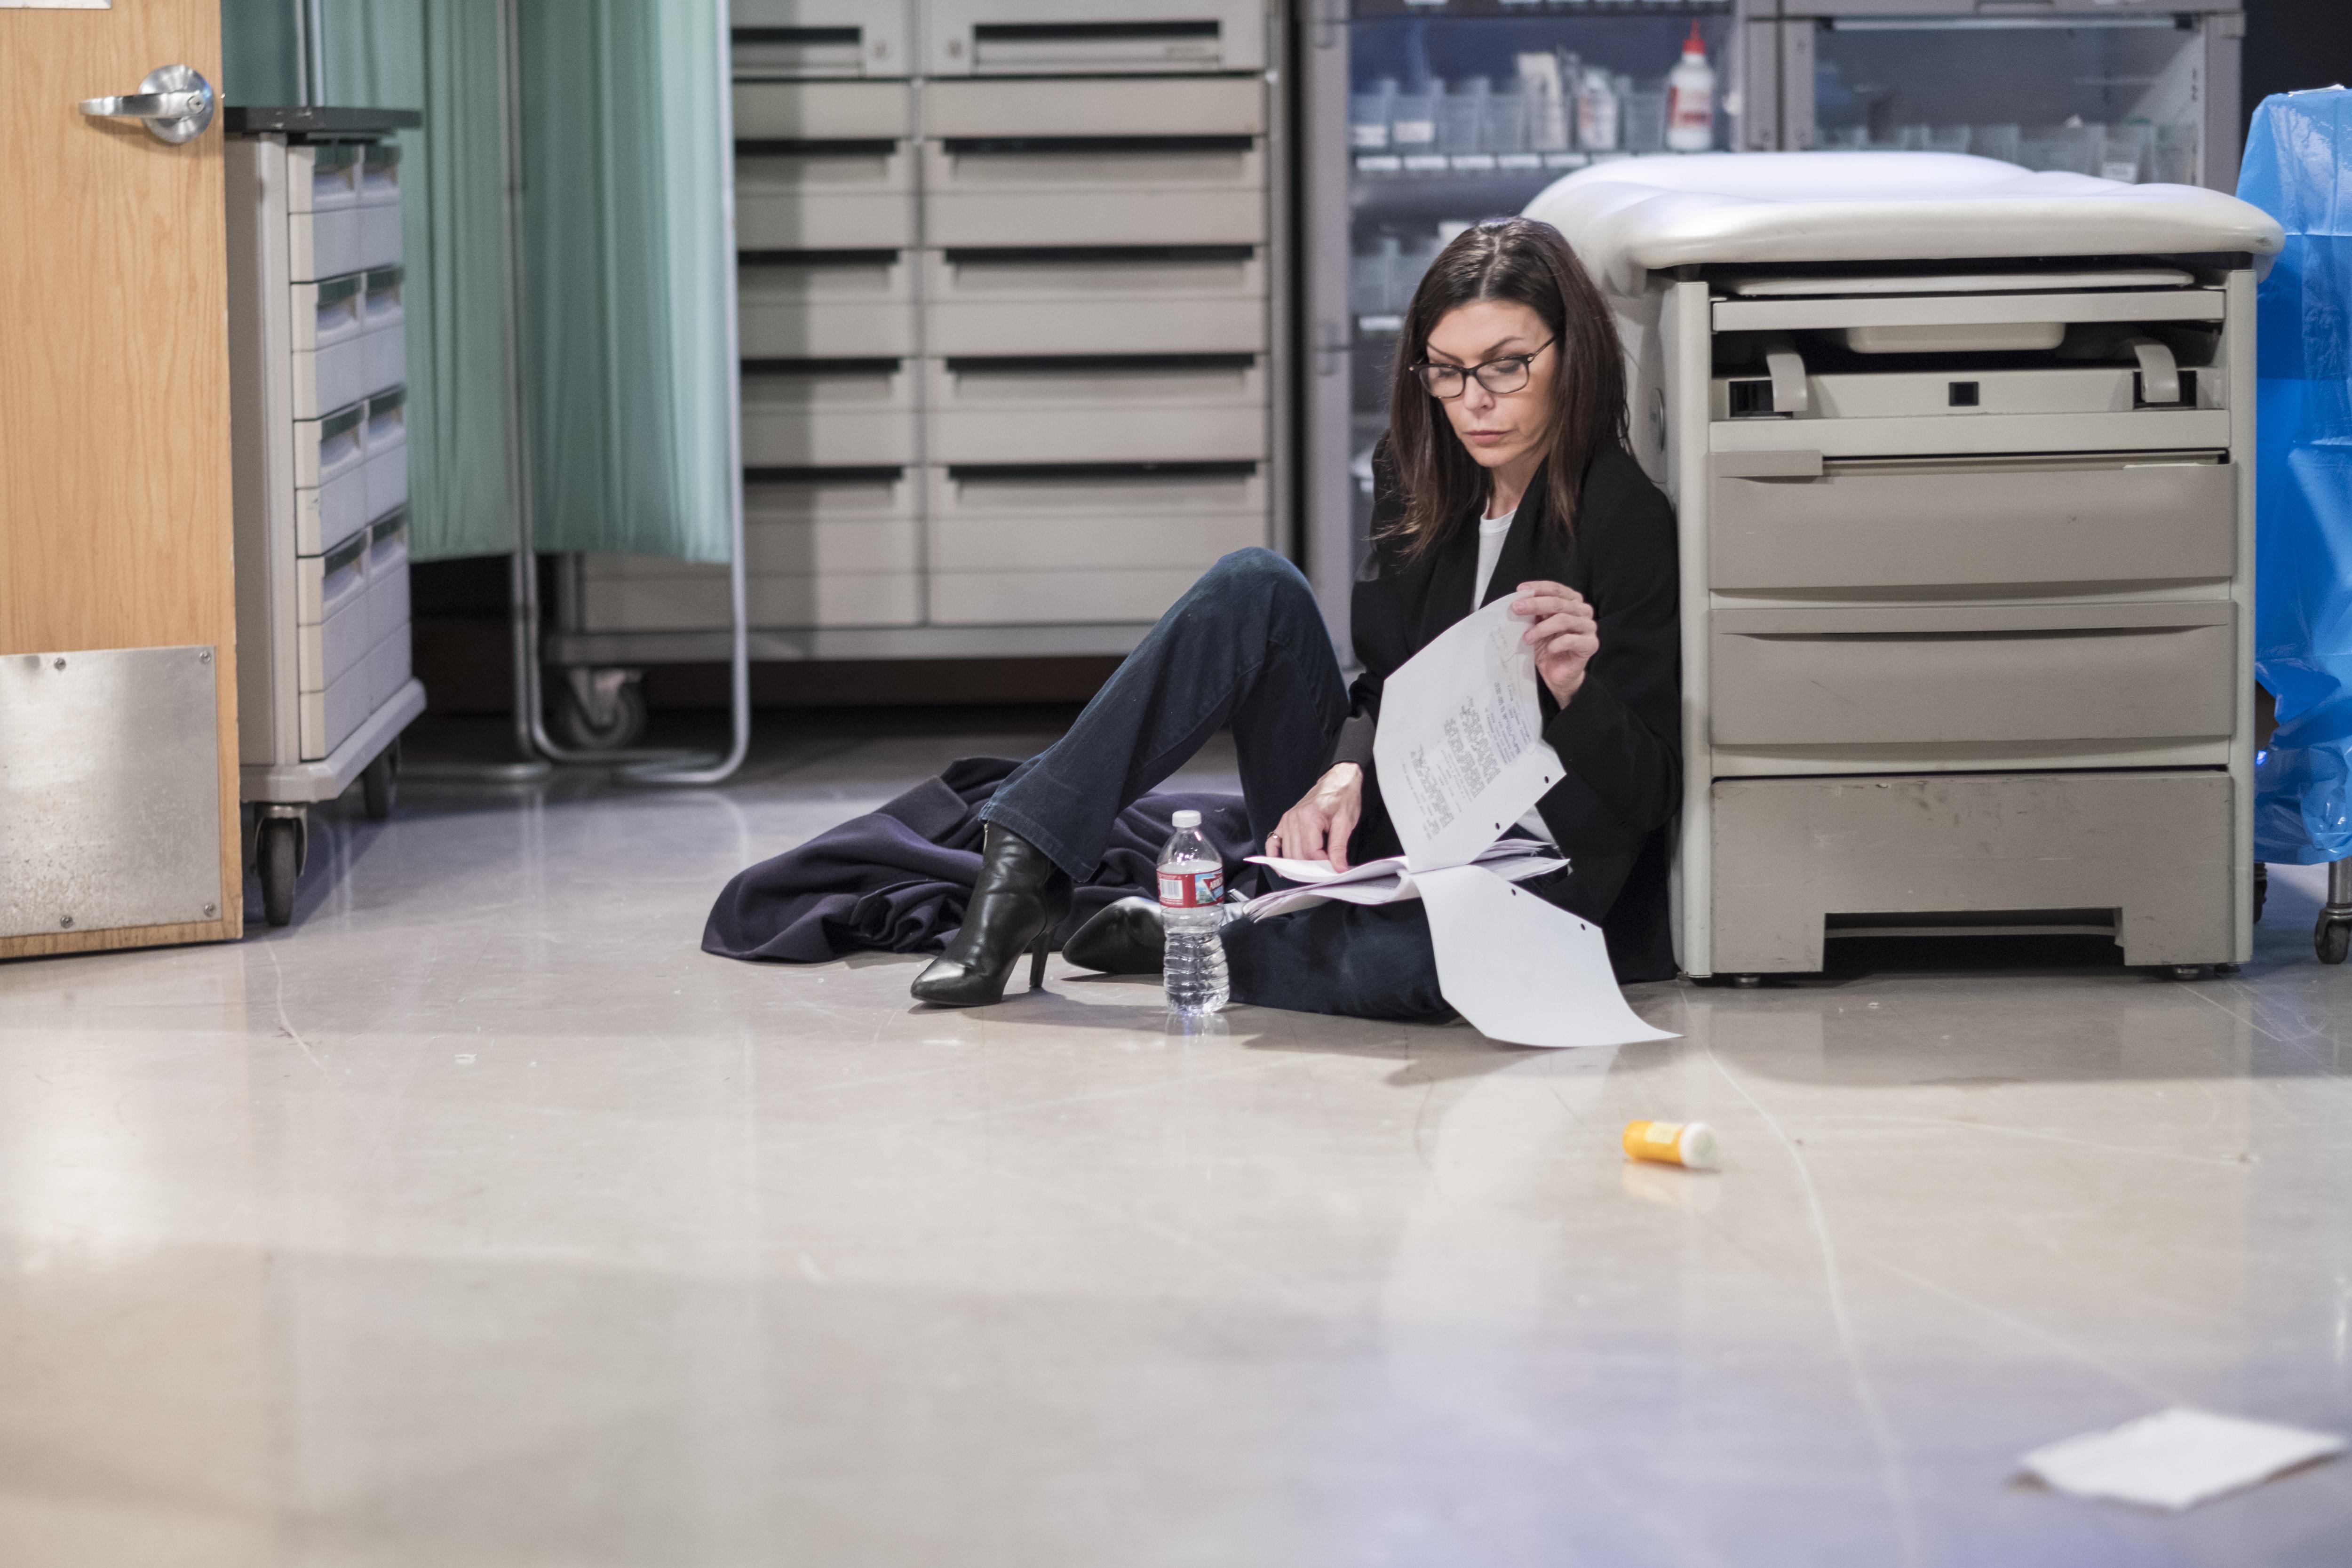 Finola Hughes on set at General Hospital